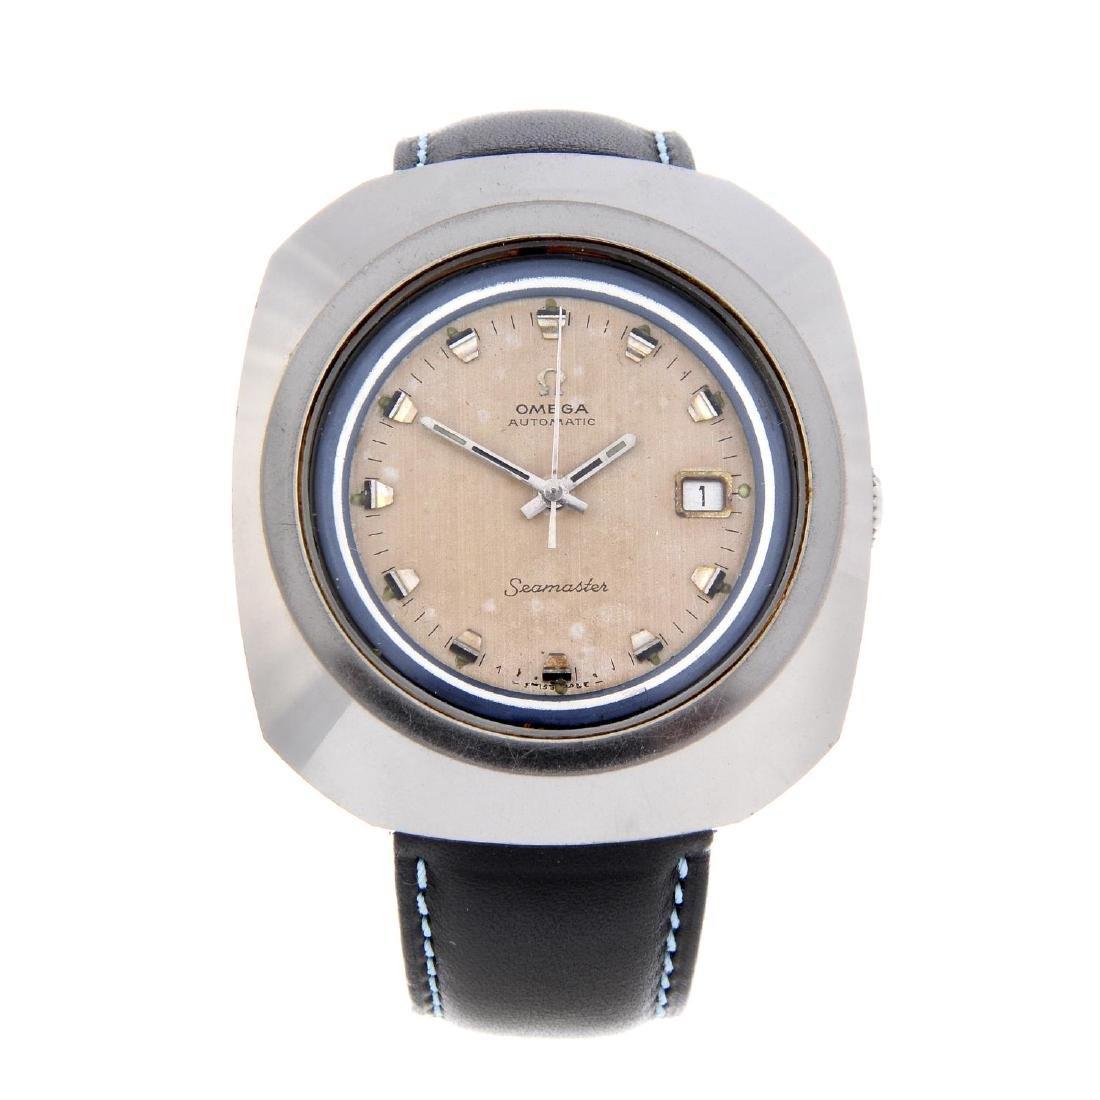 OMEGA - a gentleman's Seamaster 'Giant' wrist watch.